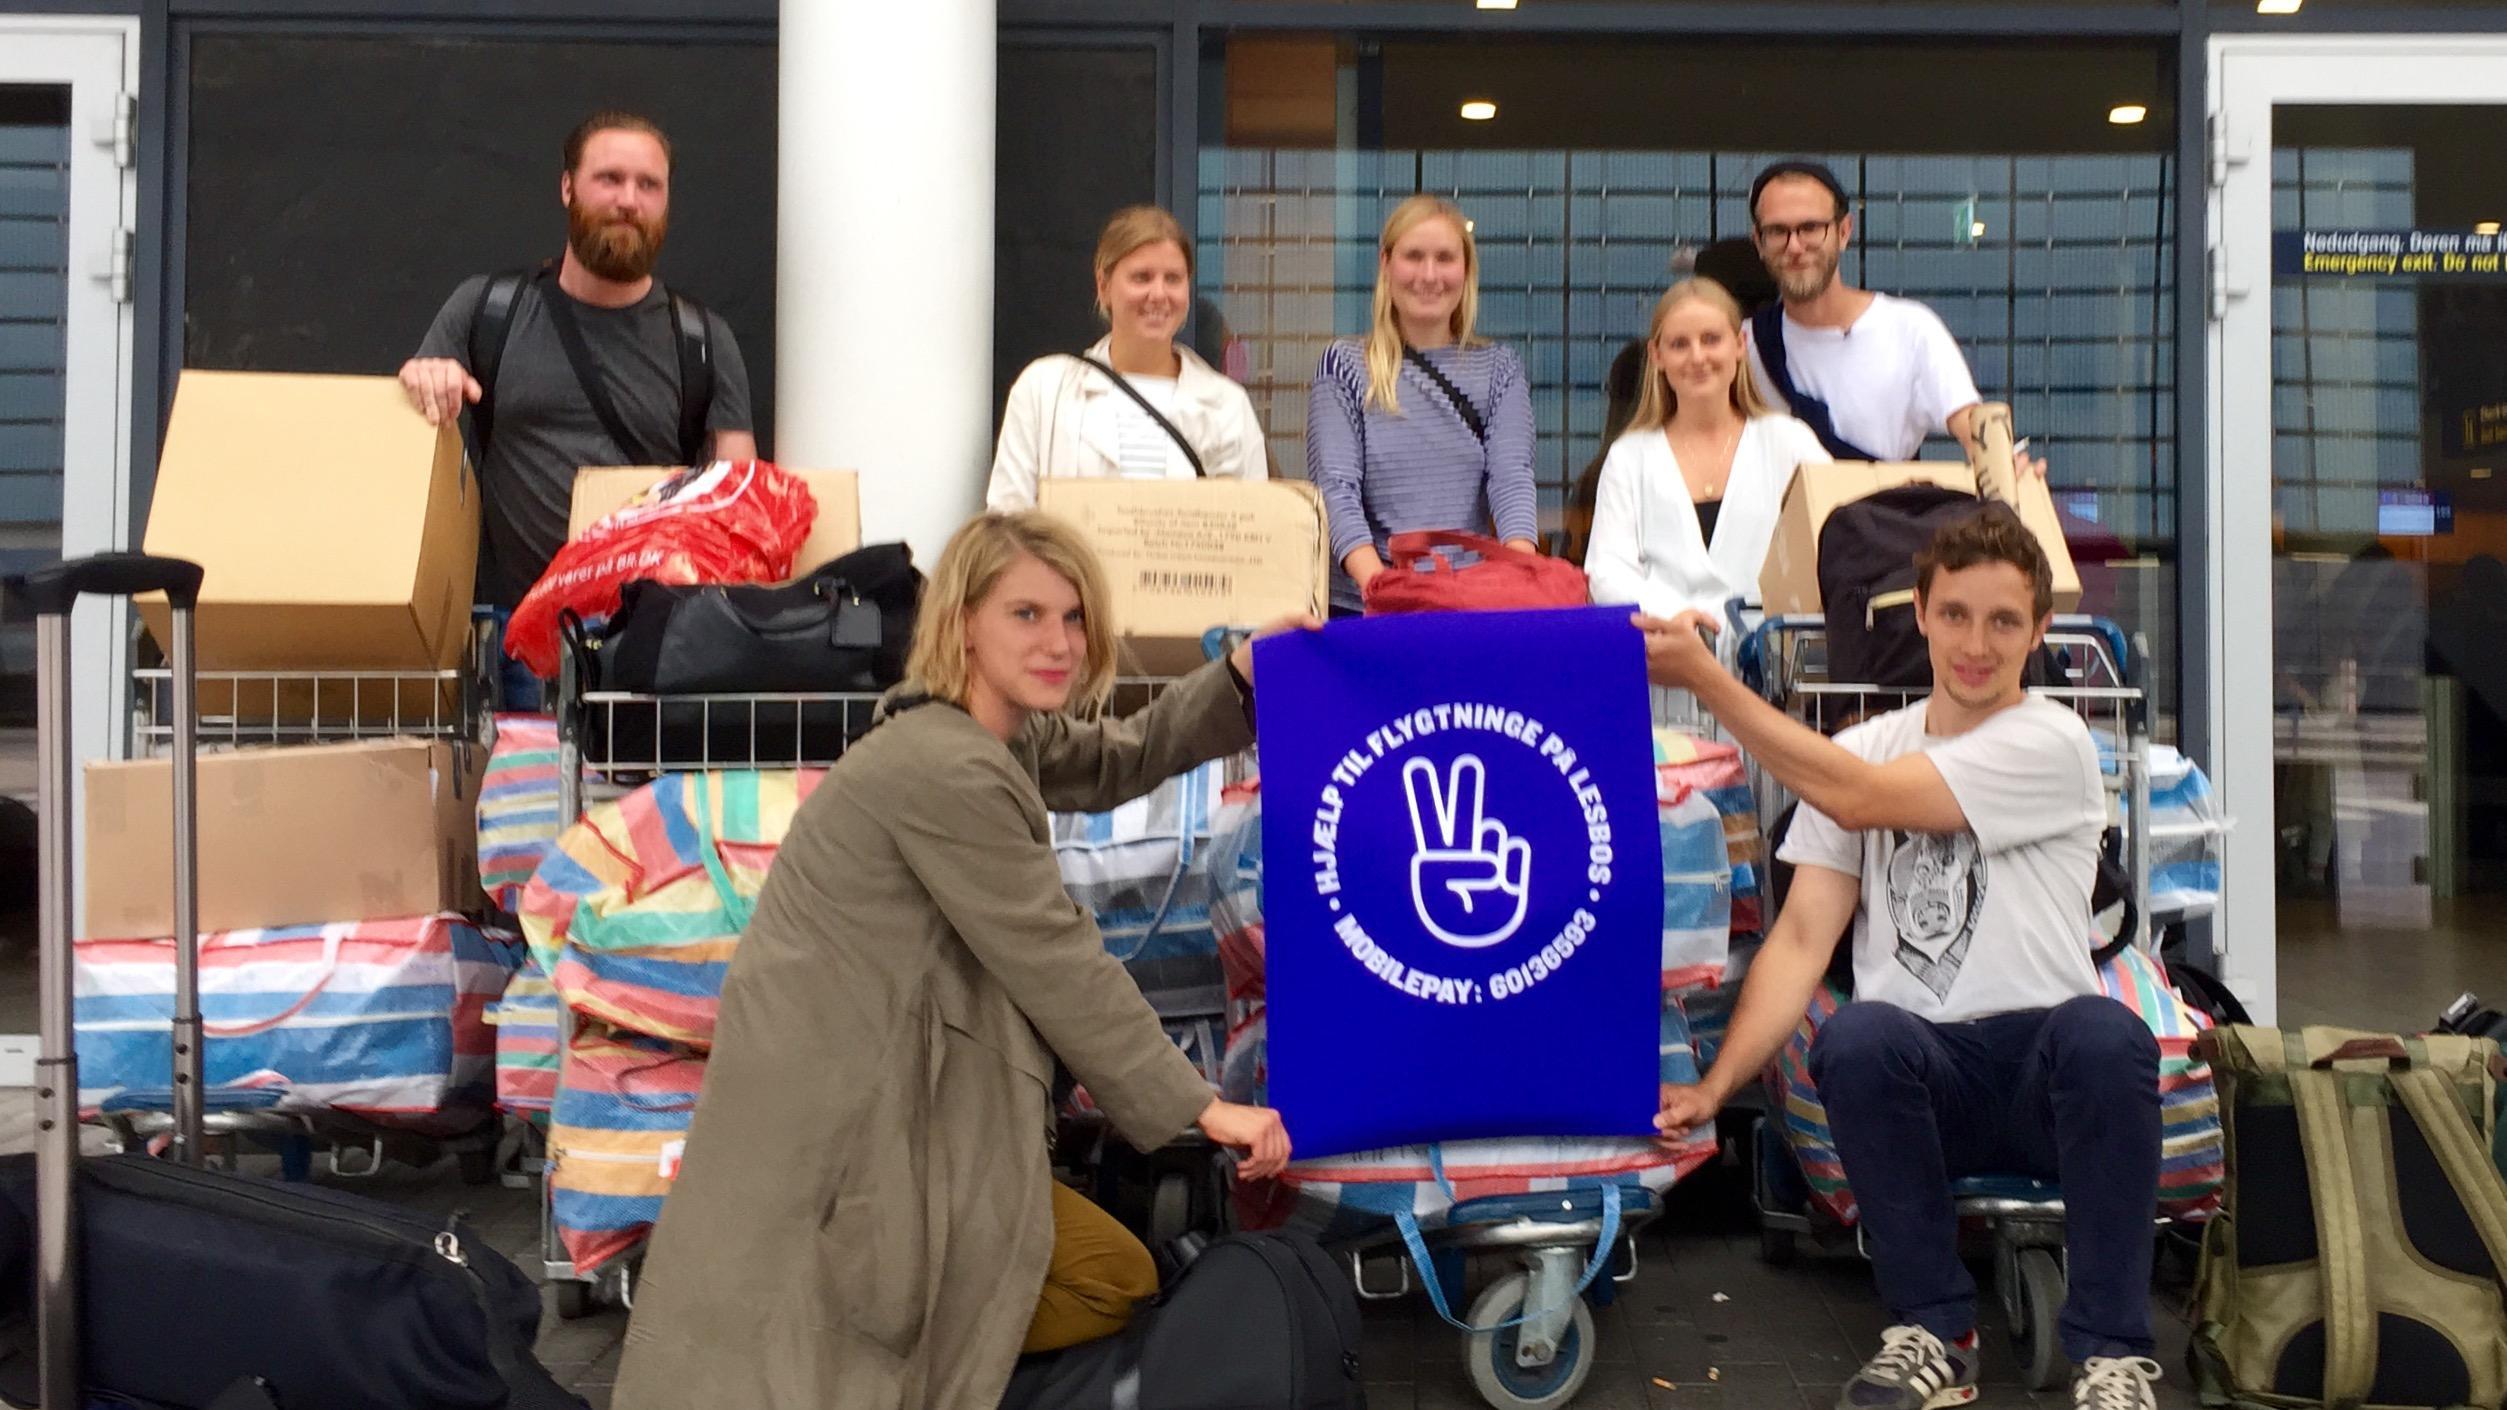 Frederik Kirkeskov og venner Lesbos flygtninge